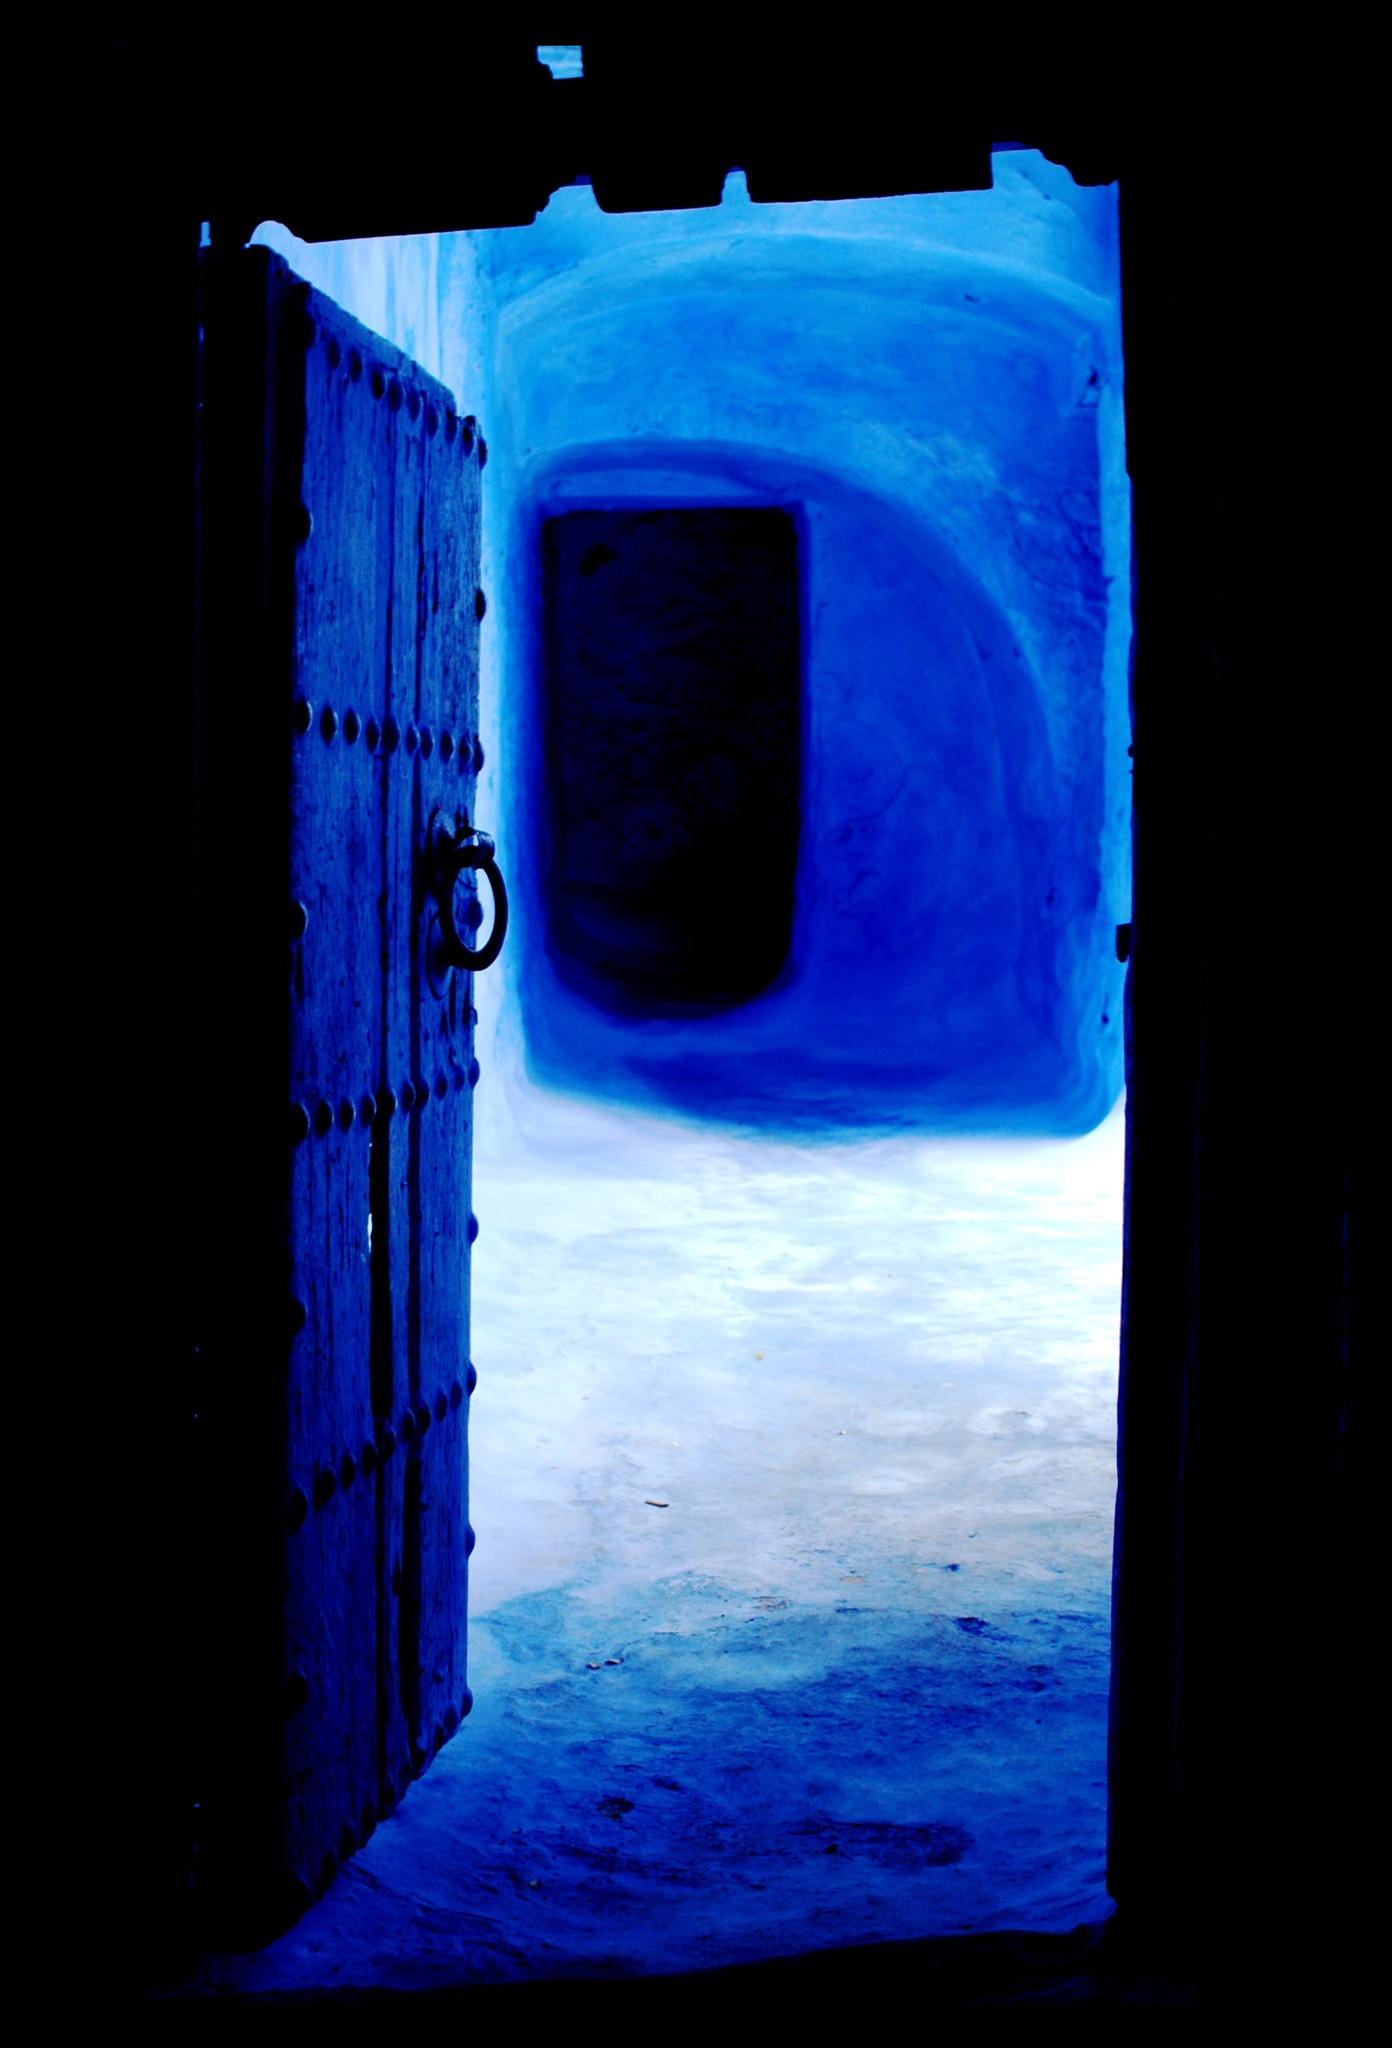 Xauen, Marruecos. by Adil Azemat